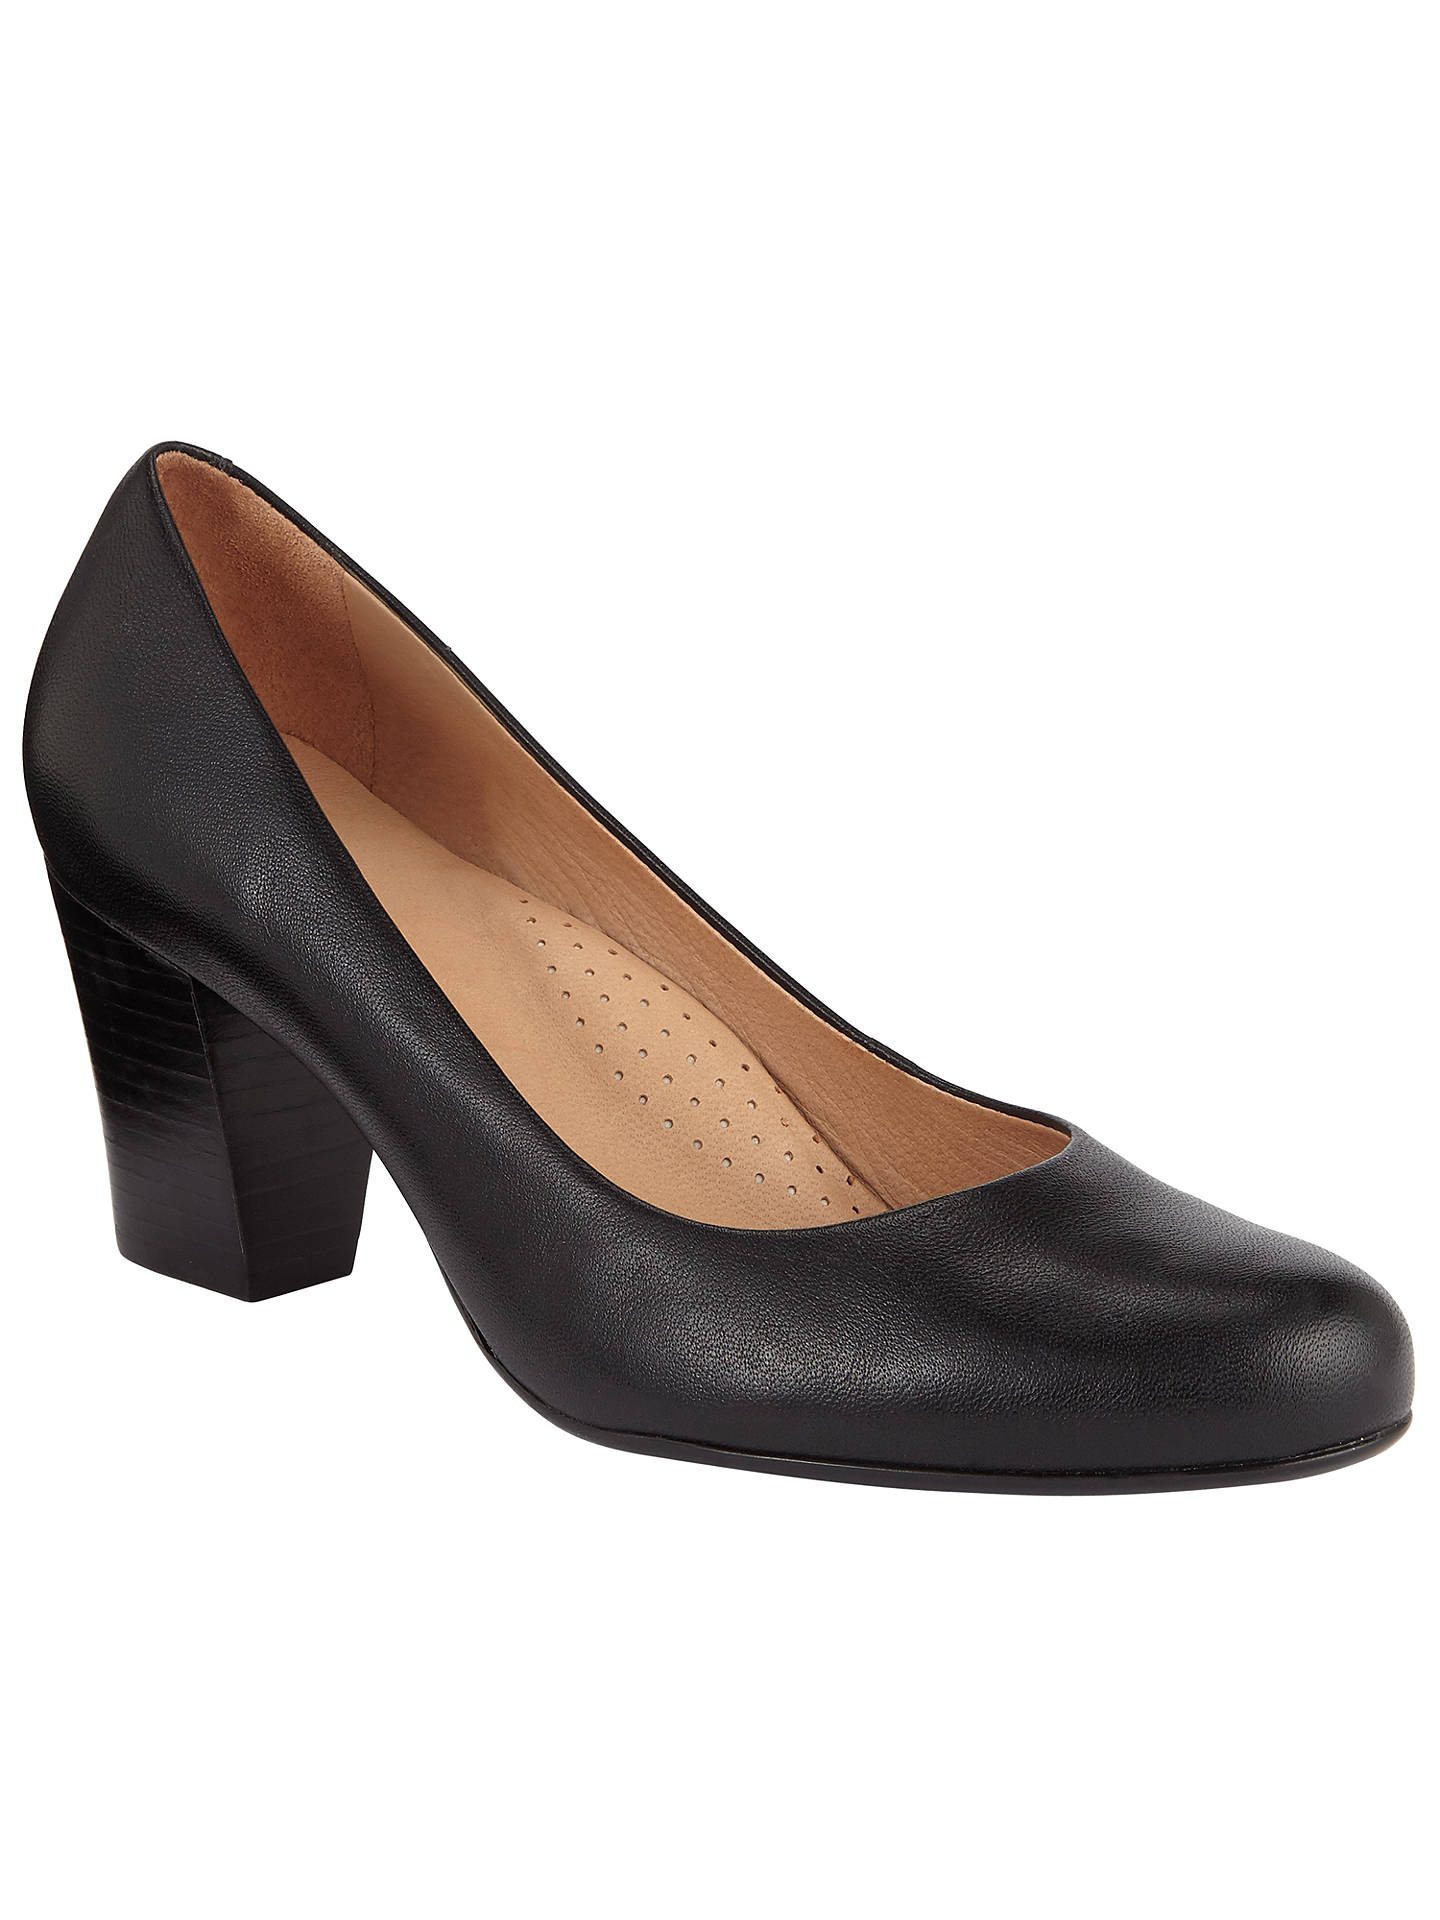 e5f6539006f John Lewis Ashlyn Block Heel Court Shoes, Black at John Lewis & Partners